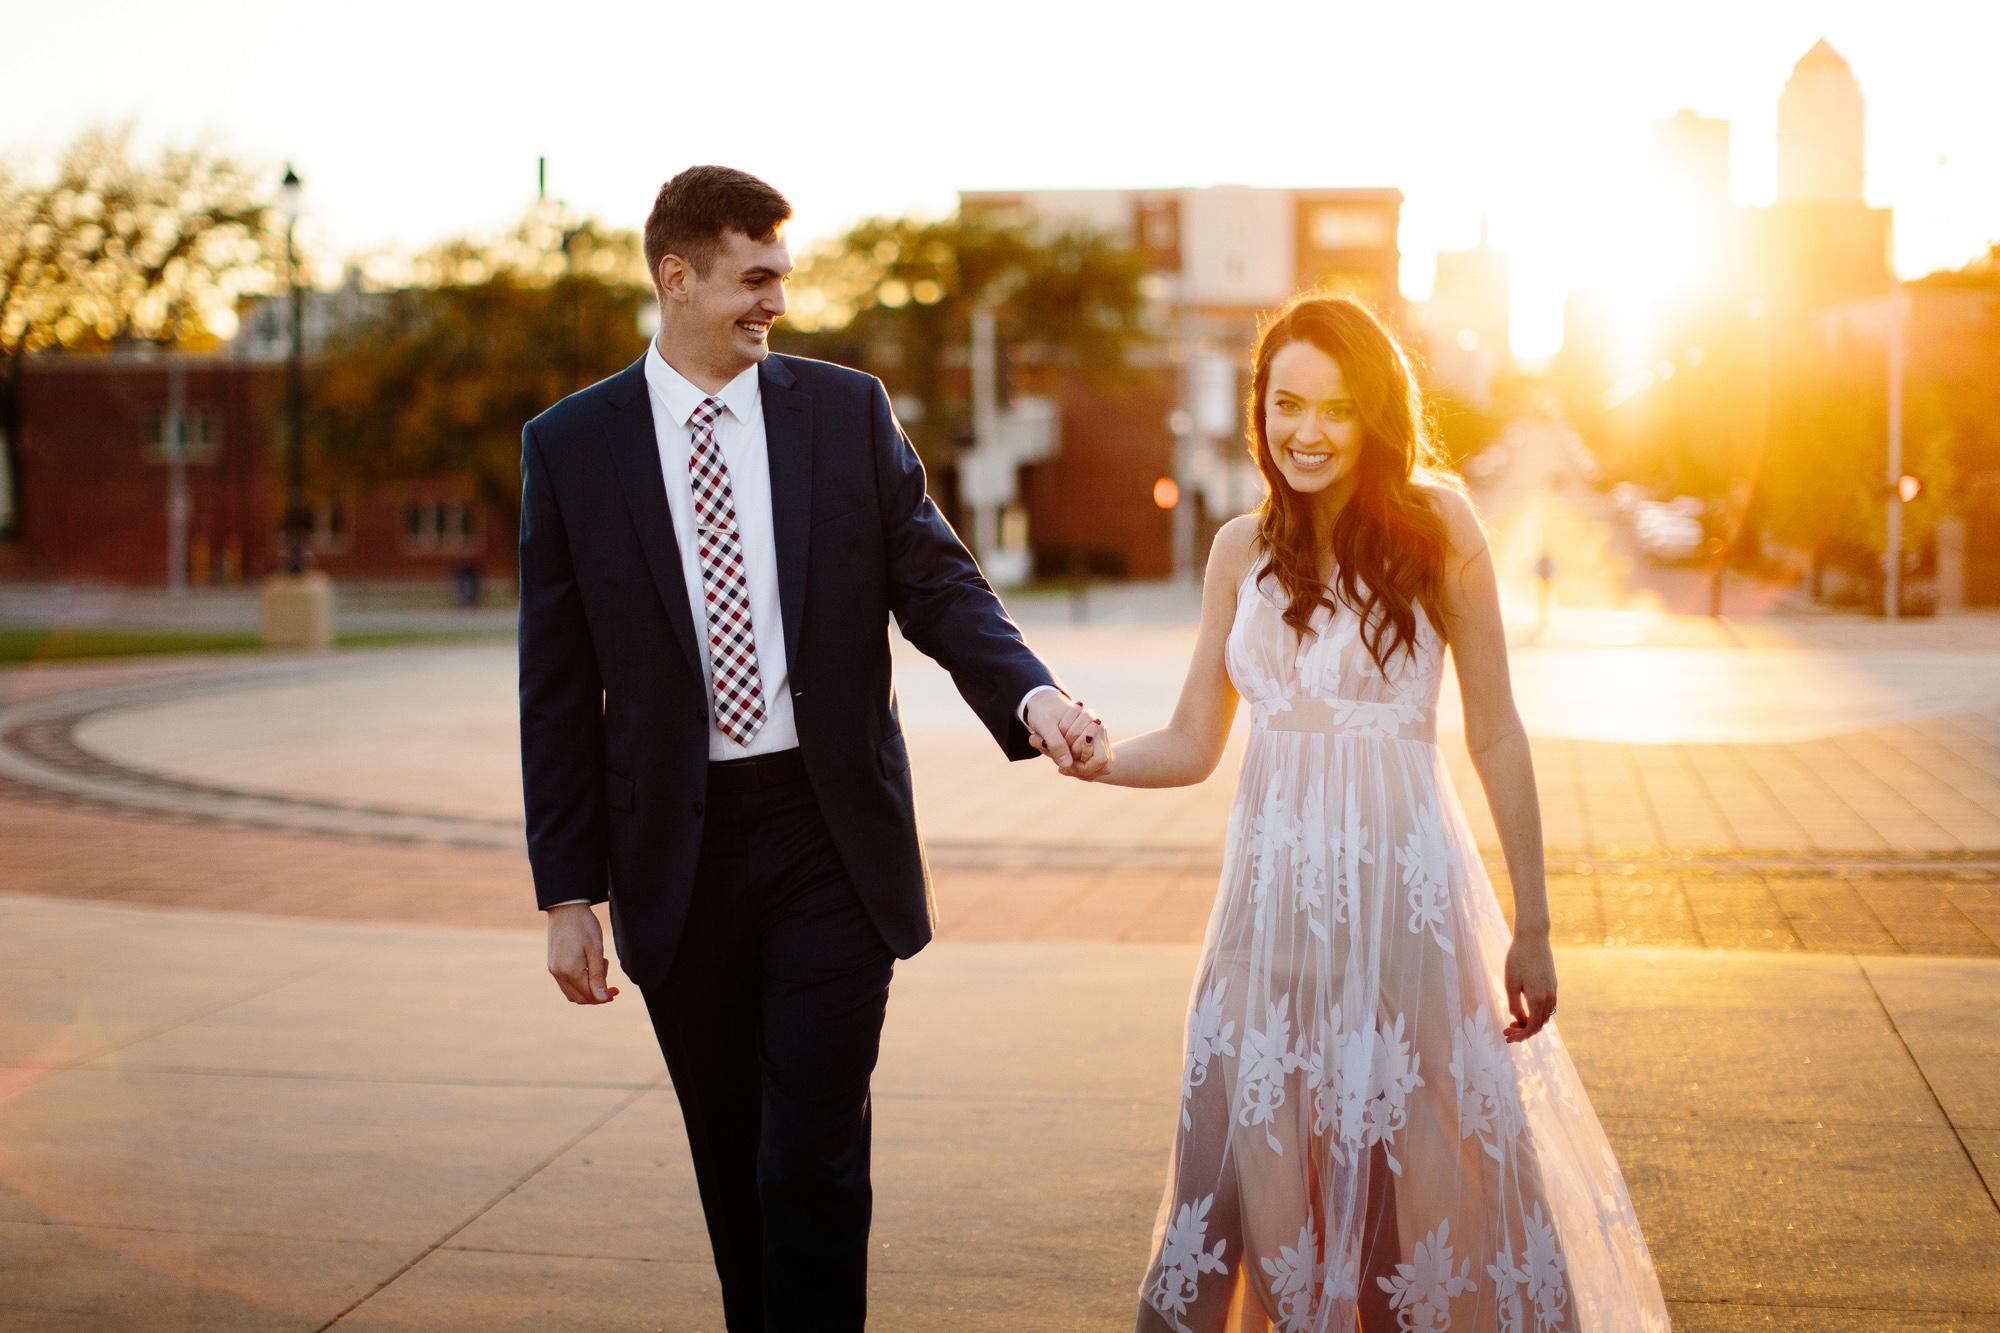 wedding-elopement-adventerous-romantic-timeless-des-moines-siouxfalls-photography-34.jpg